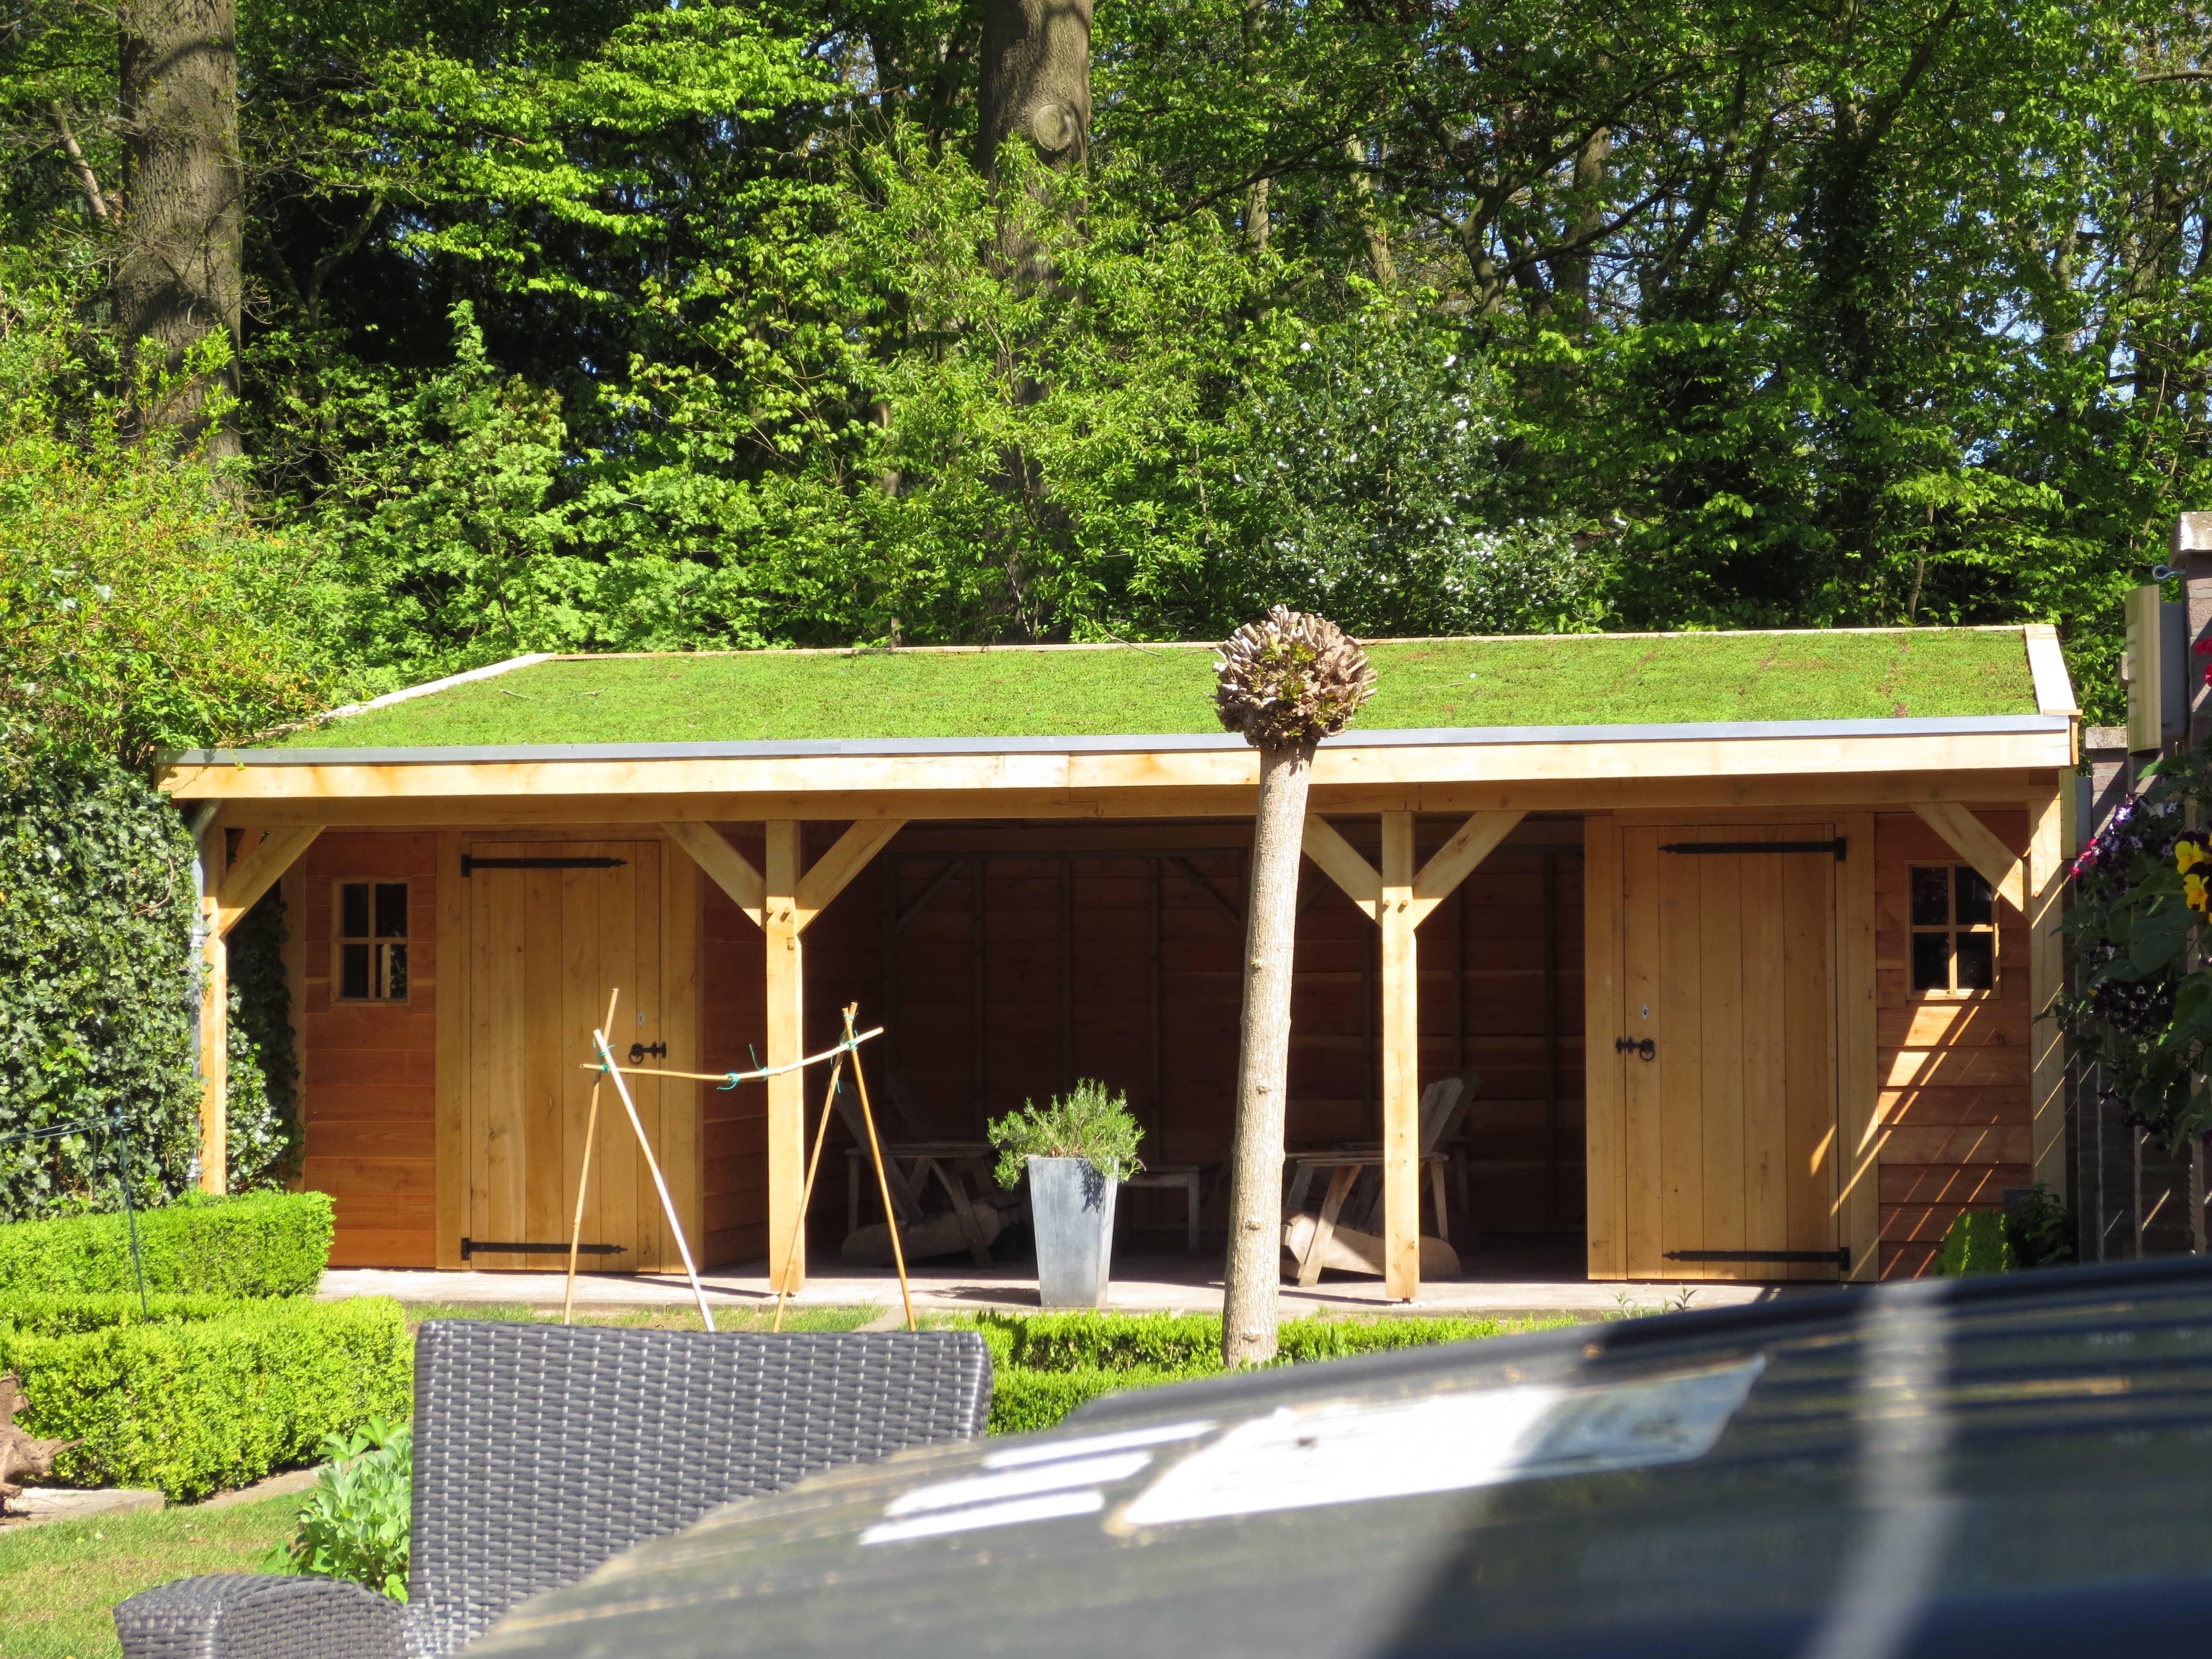 houten-tuinhuis-groendak - Tuinhuis met Groendak